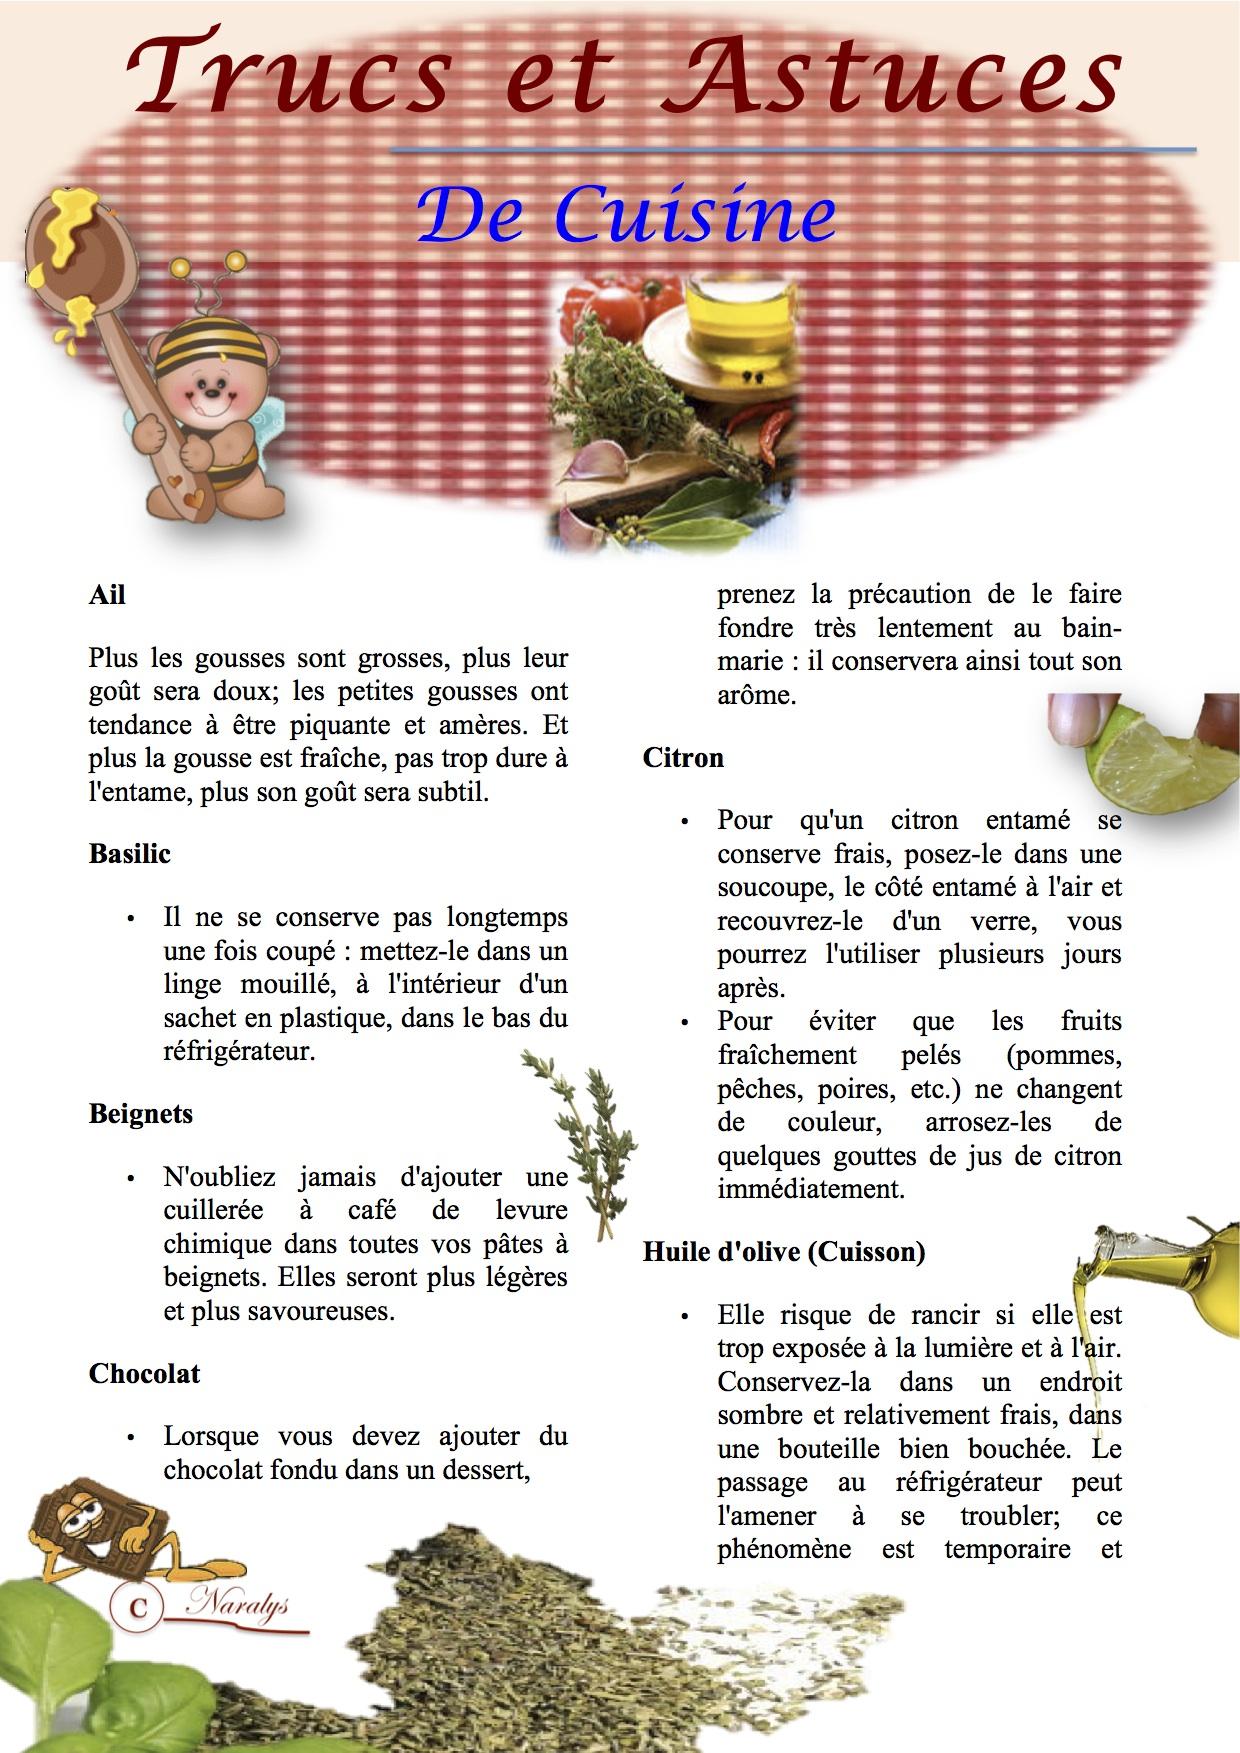 eglise adventiste smyrne - astuces culinaires